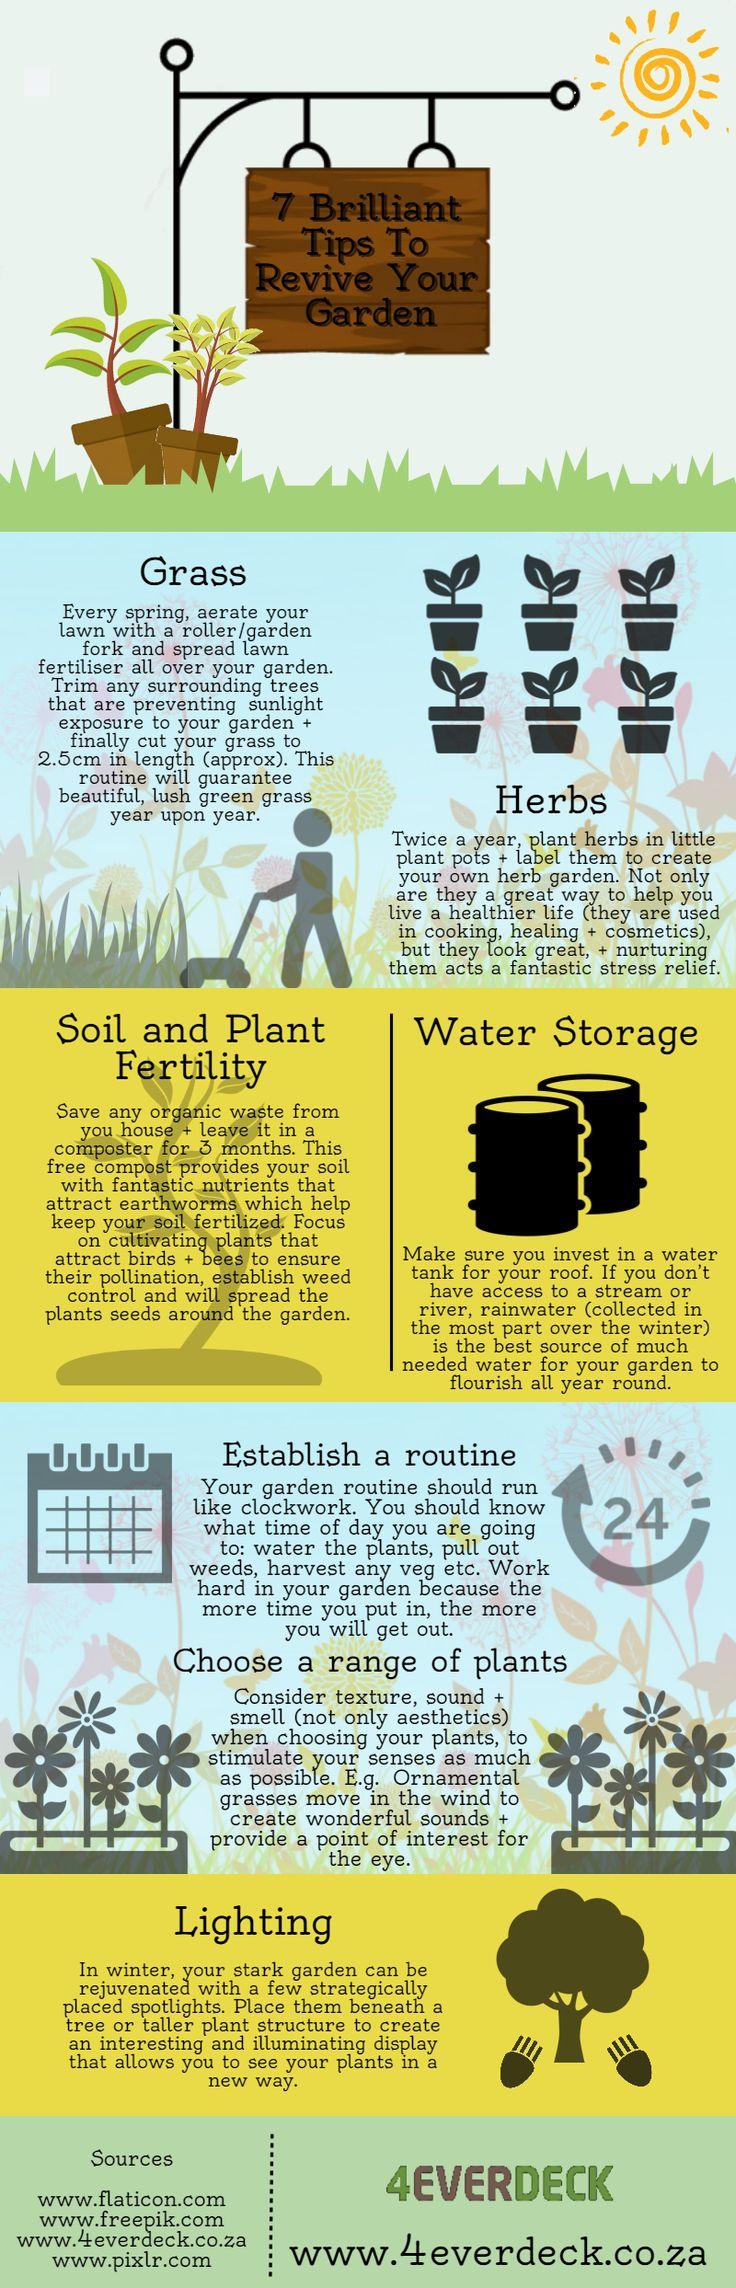 10 best Irrigatie images on Pinterest   Backyard ideas, Drip ...